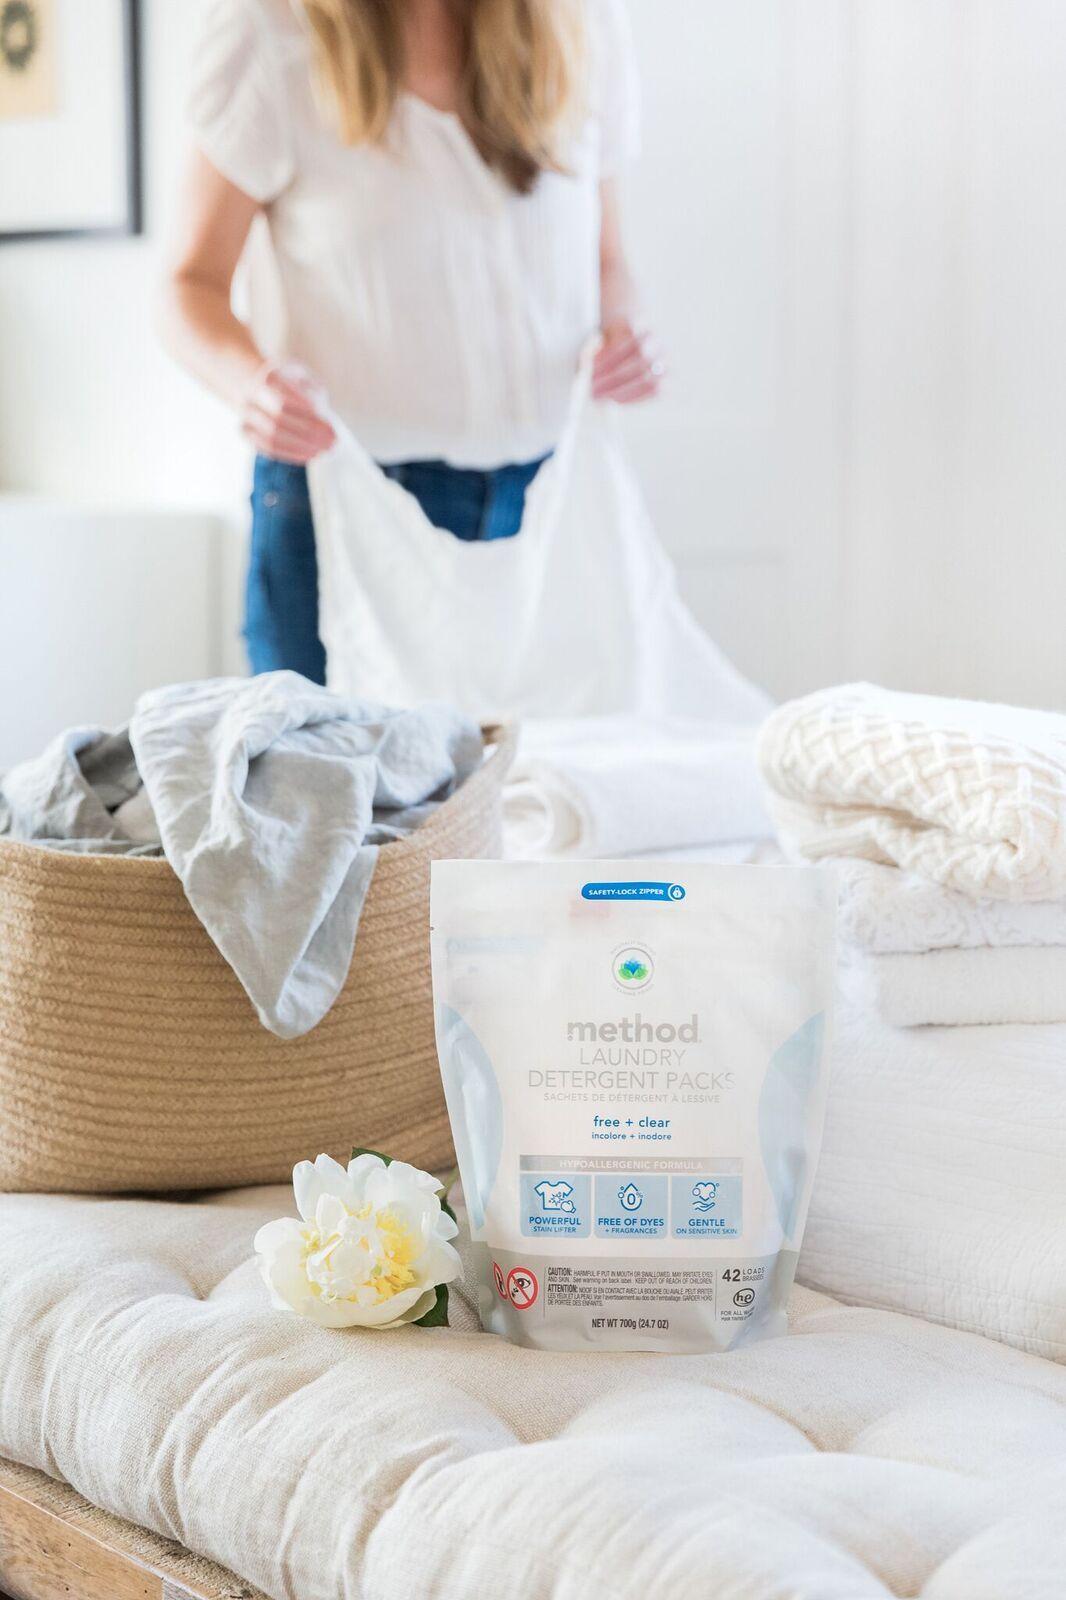 Laundry Detergent Packs In 2020 Method Laundry Detergent